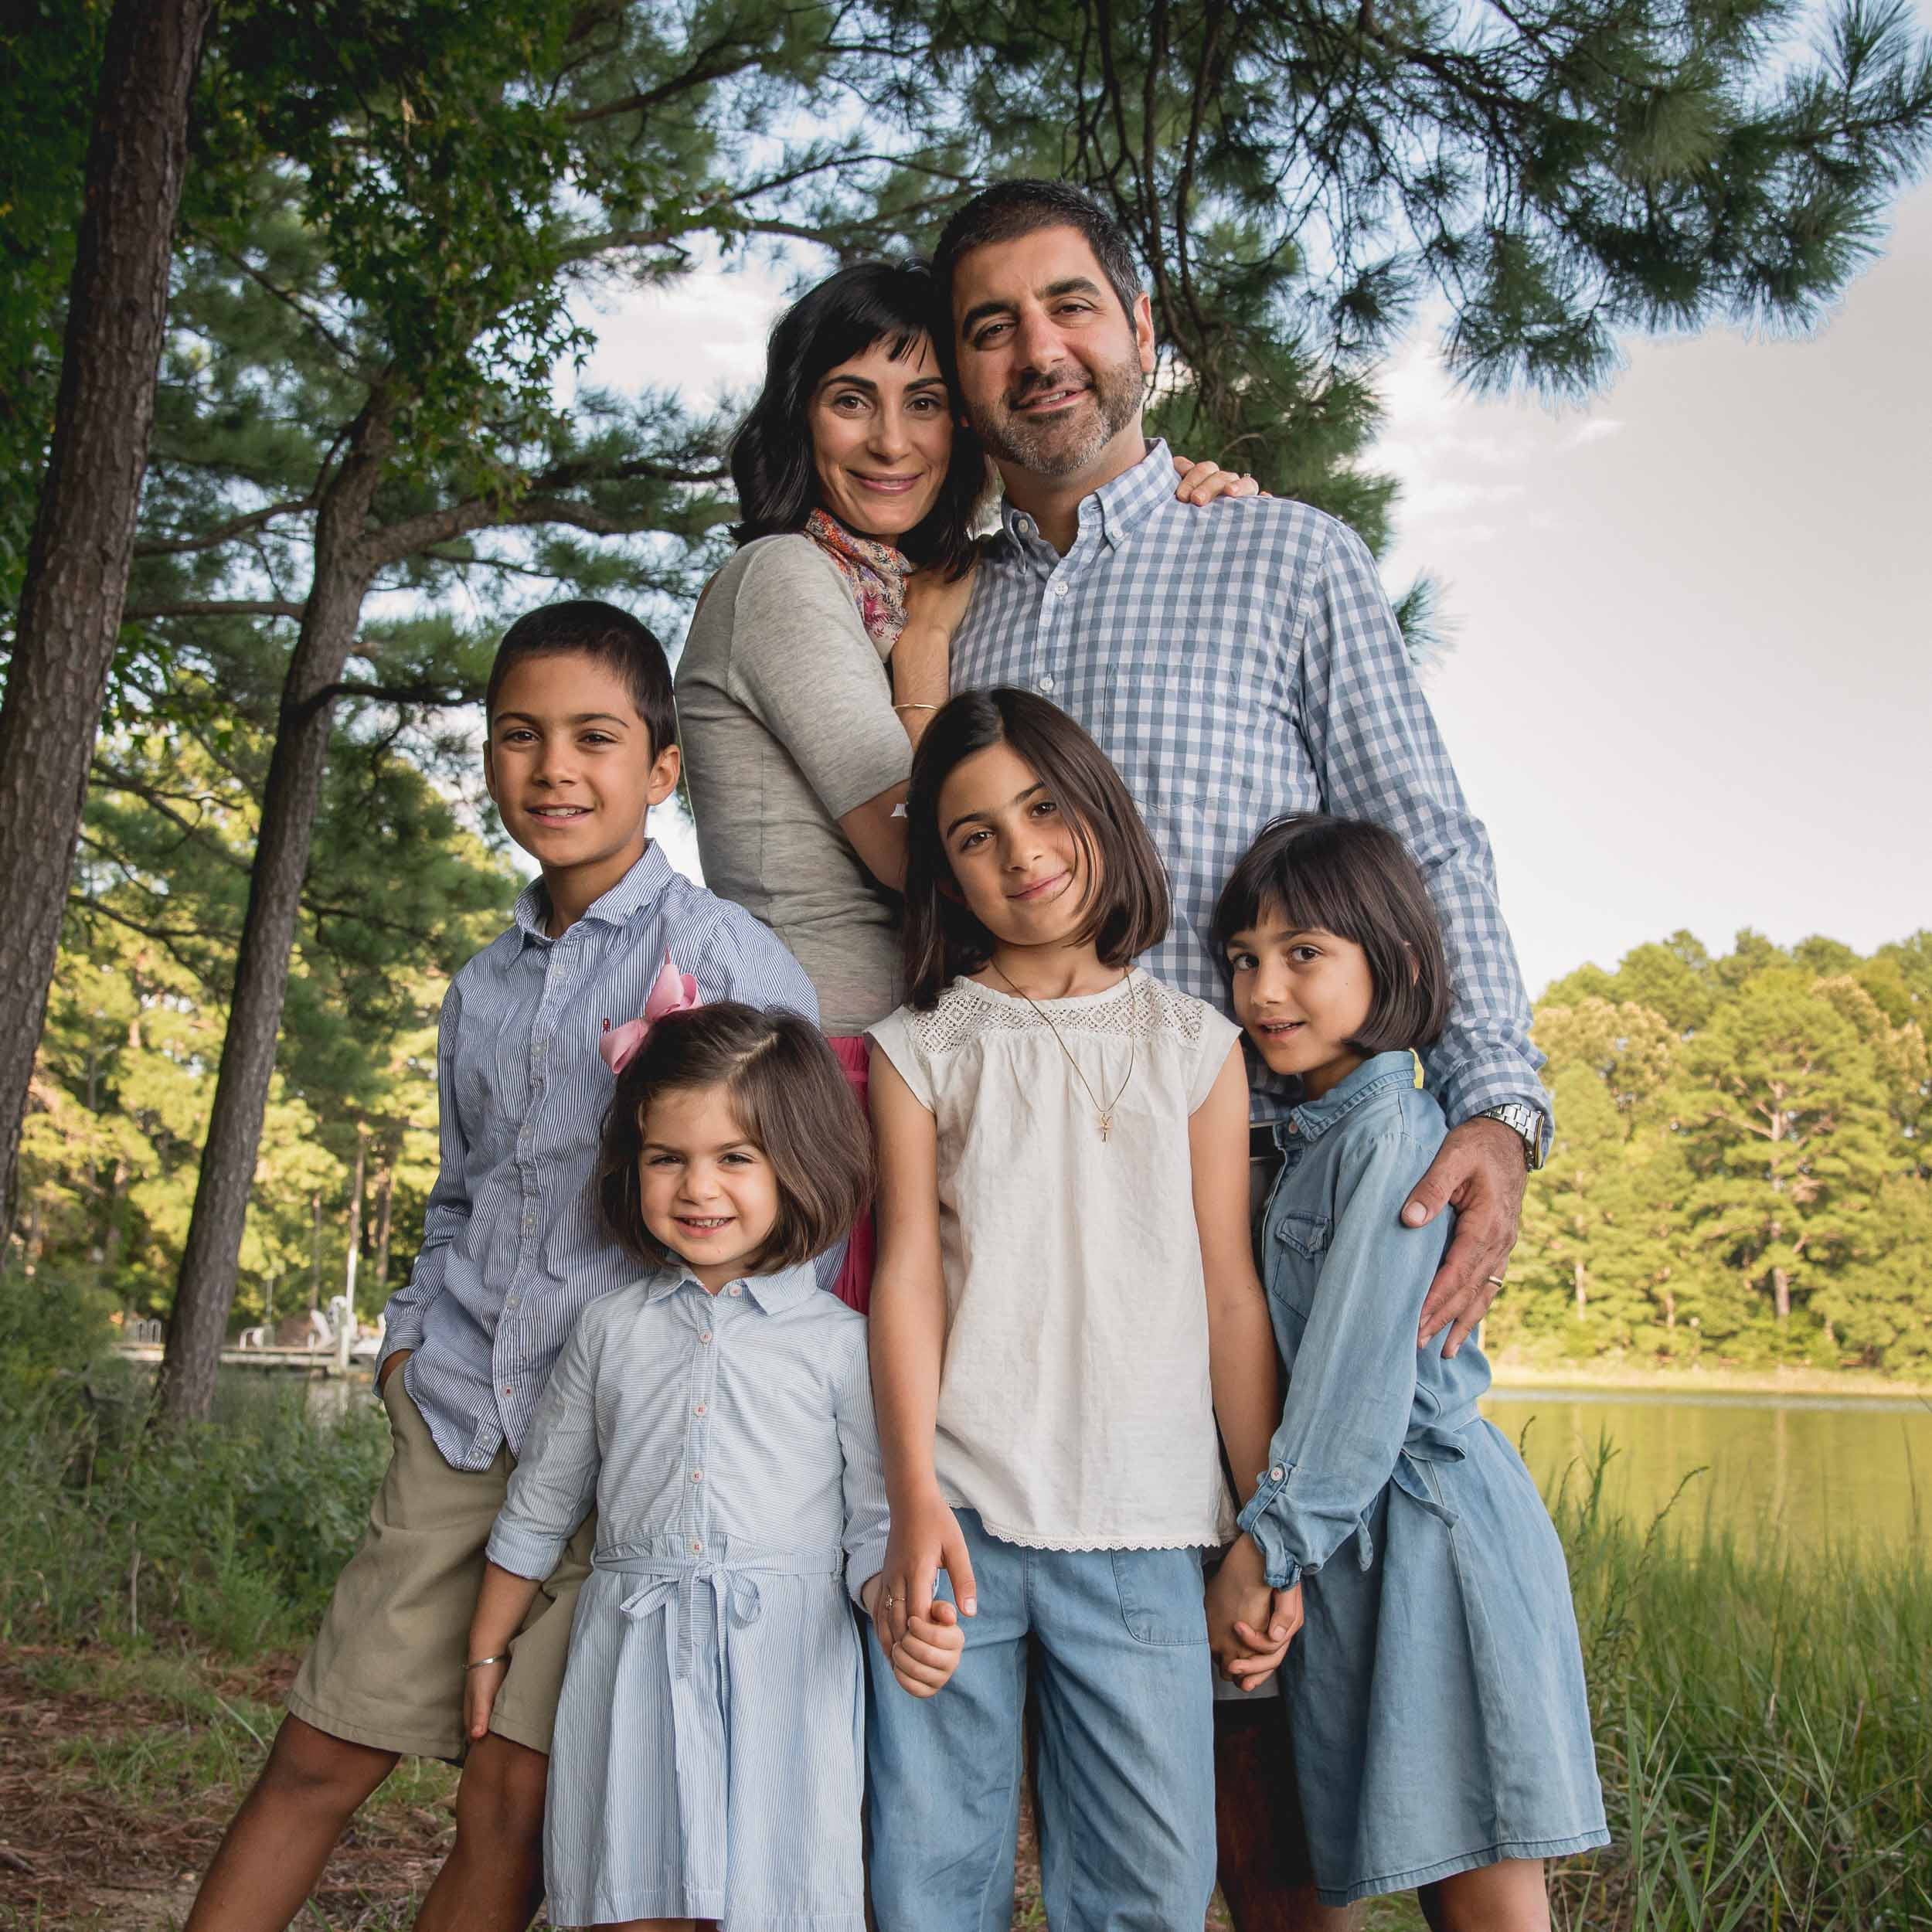 Family_Senior_Wedding_Maryland_Photographer_Sonny_and_Allison_Favorites_Easton_Crofton_Oxford-51.jpg